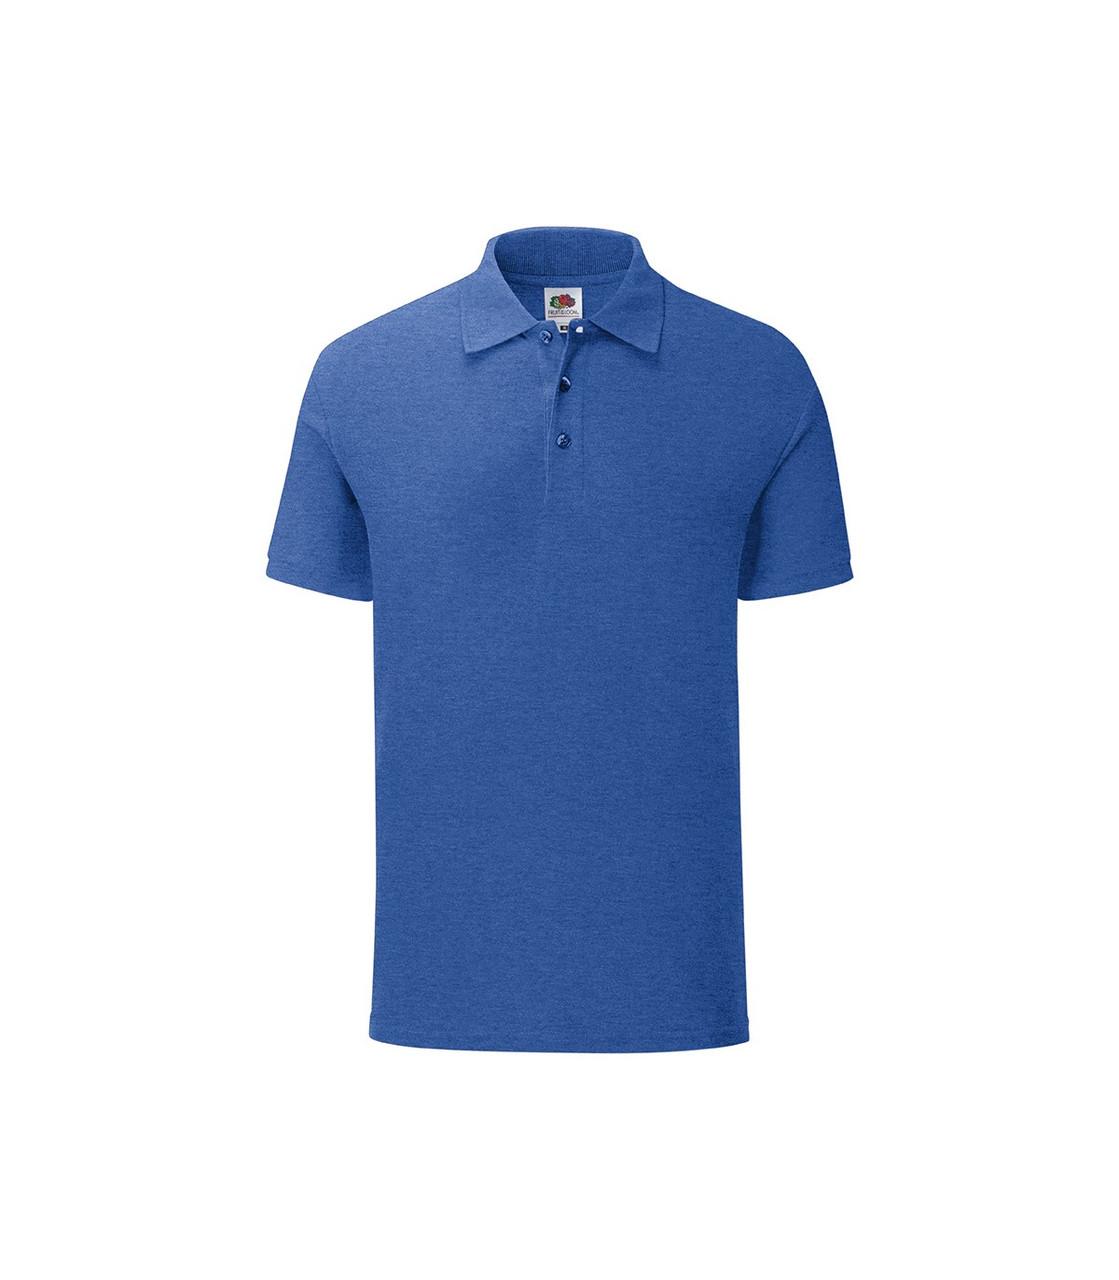 Мужская футболка поло хлопок синяя меланж 044-R6